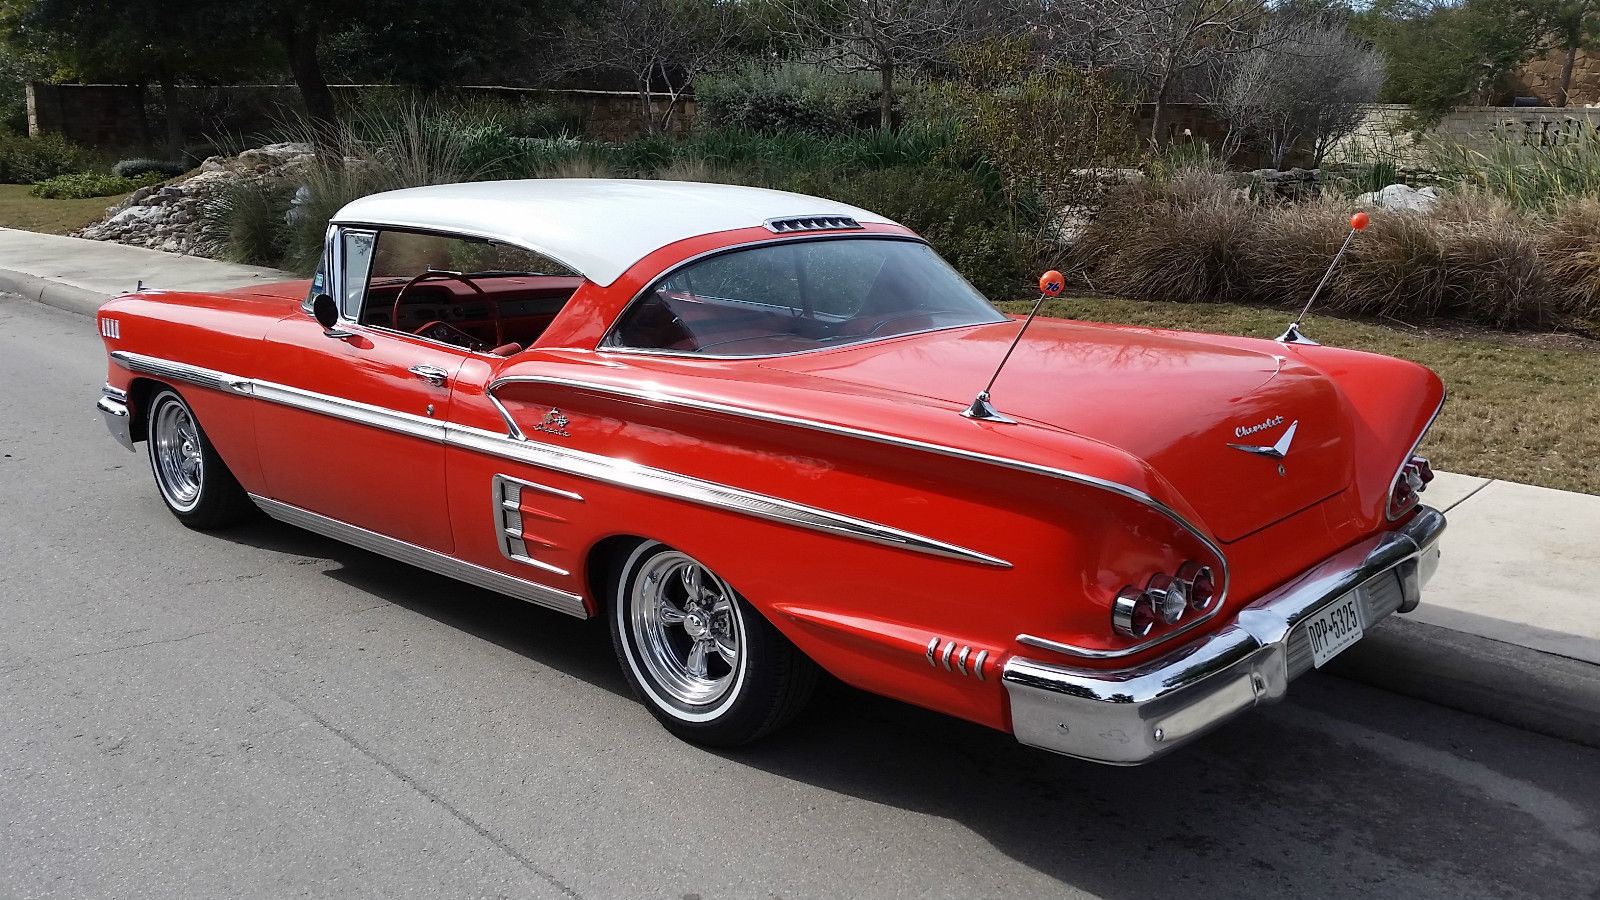 1958 chevy impala sport coupe 2 door hardtop 327 sb 4 speed complete solid. Black Bedroom Furniture Sets. Home Design Ideas